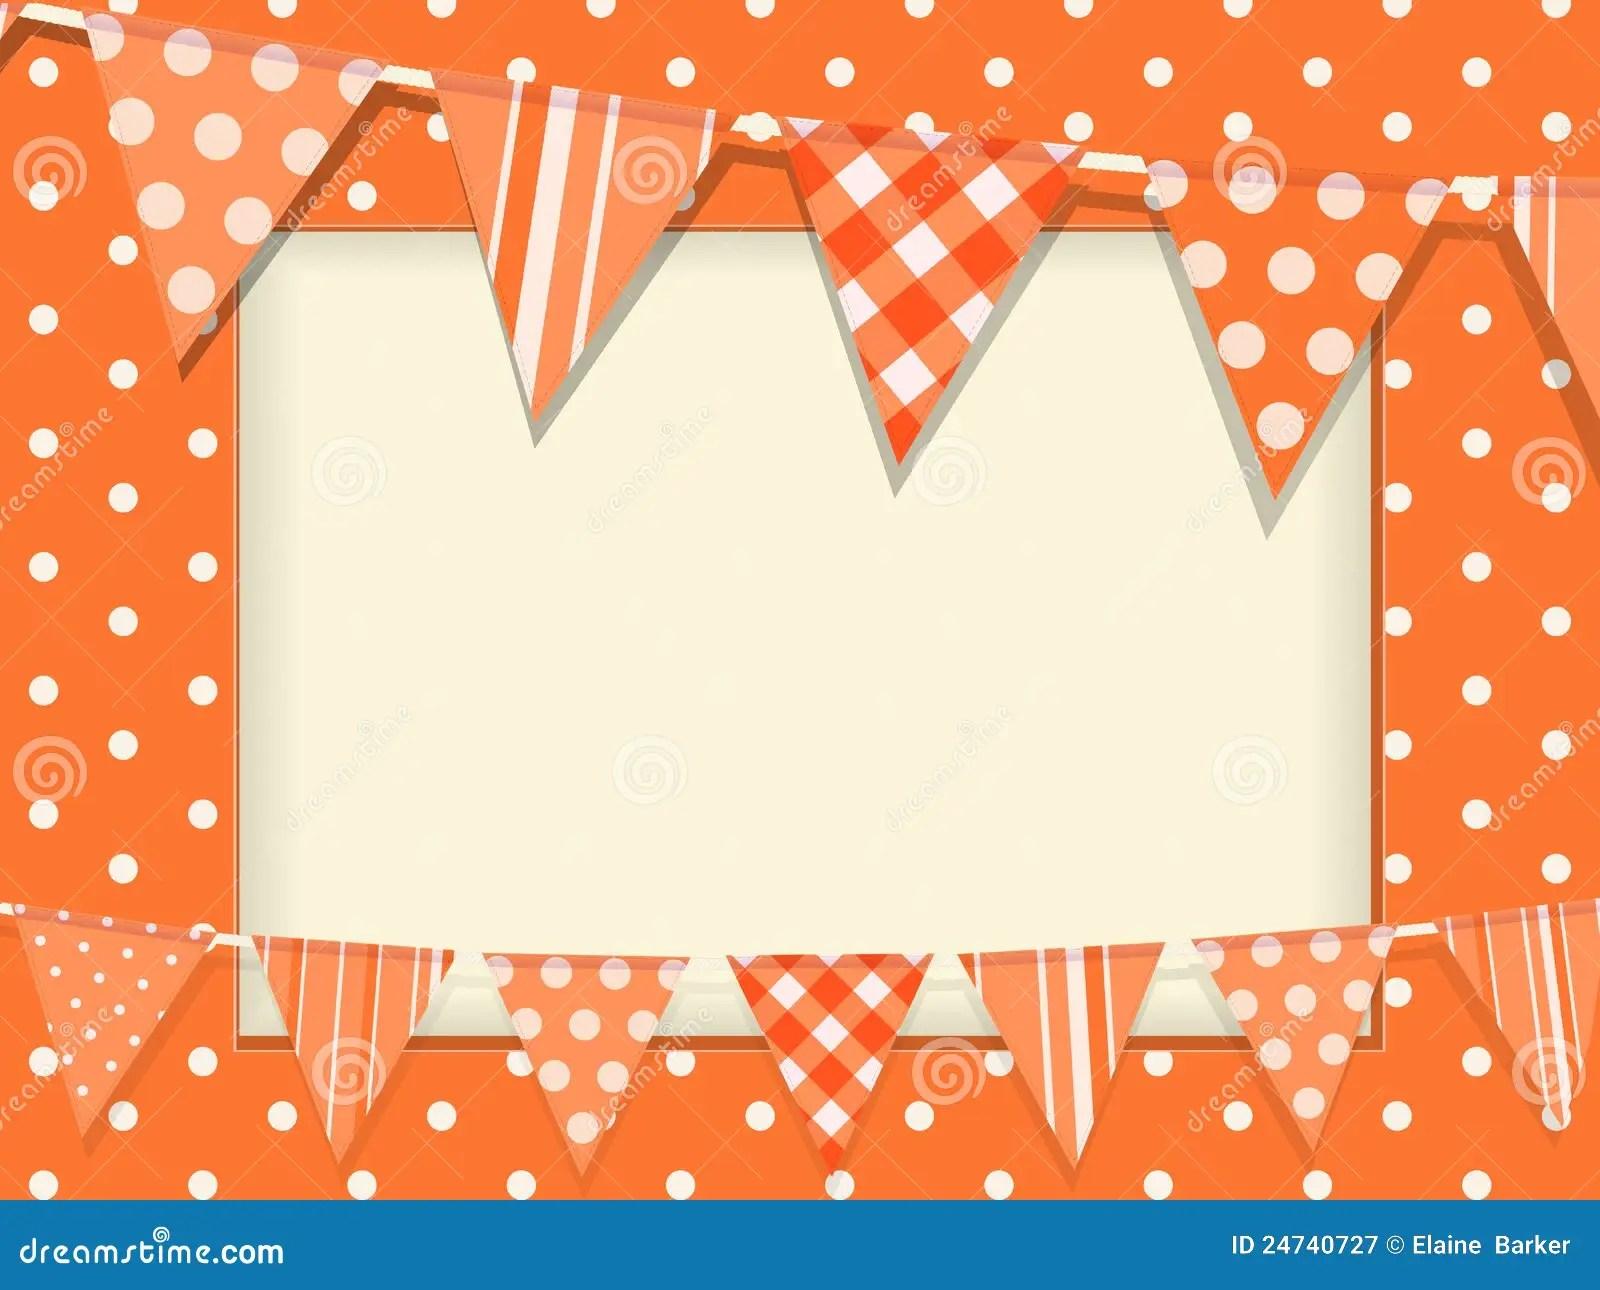 Free Fall Photos Wallpaper Bunting And Orange Polka Dot Frame Stock Vector